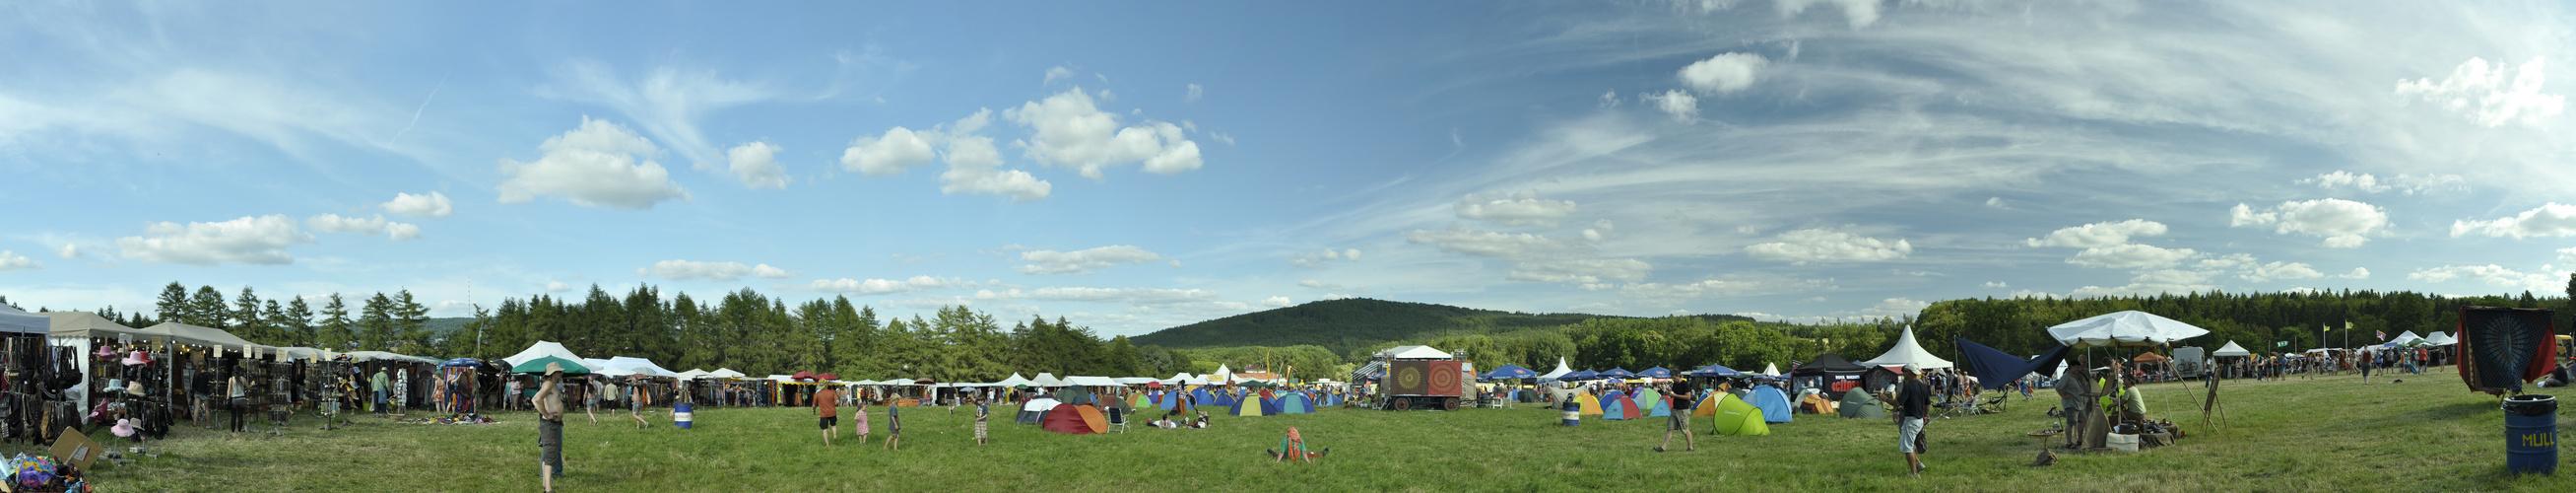 Hippie-Festival '13 180°